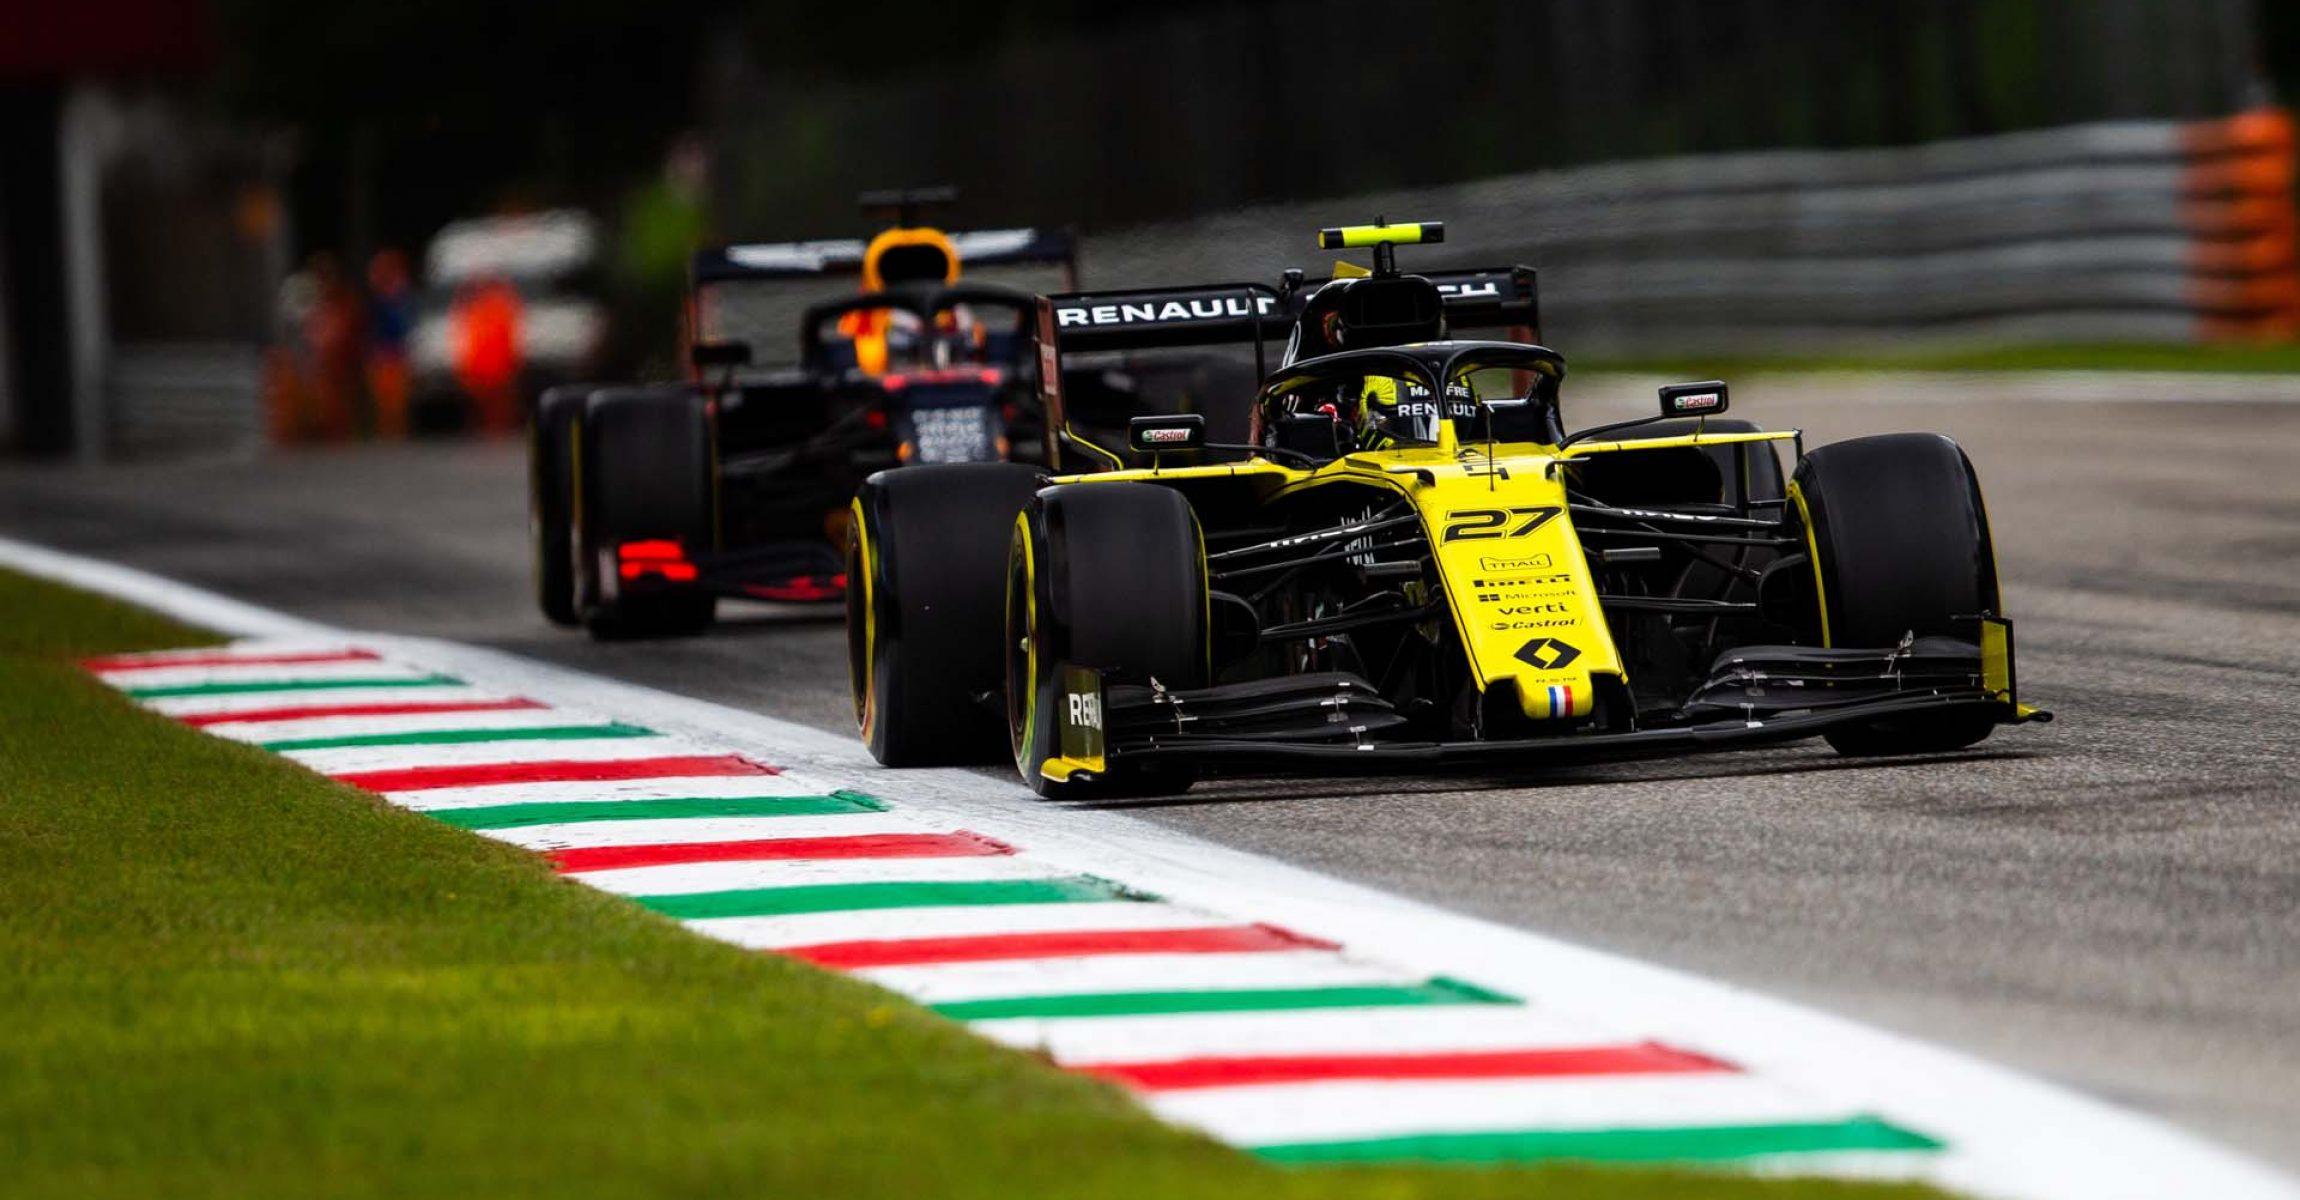 Nico Hülkenberg (GER) Renault F1 Team RS19. Italian Grand Prix, Friday 6th September 2019. Monza Italy.